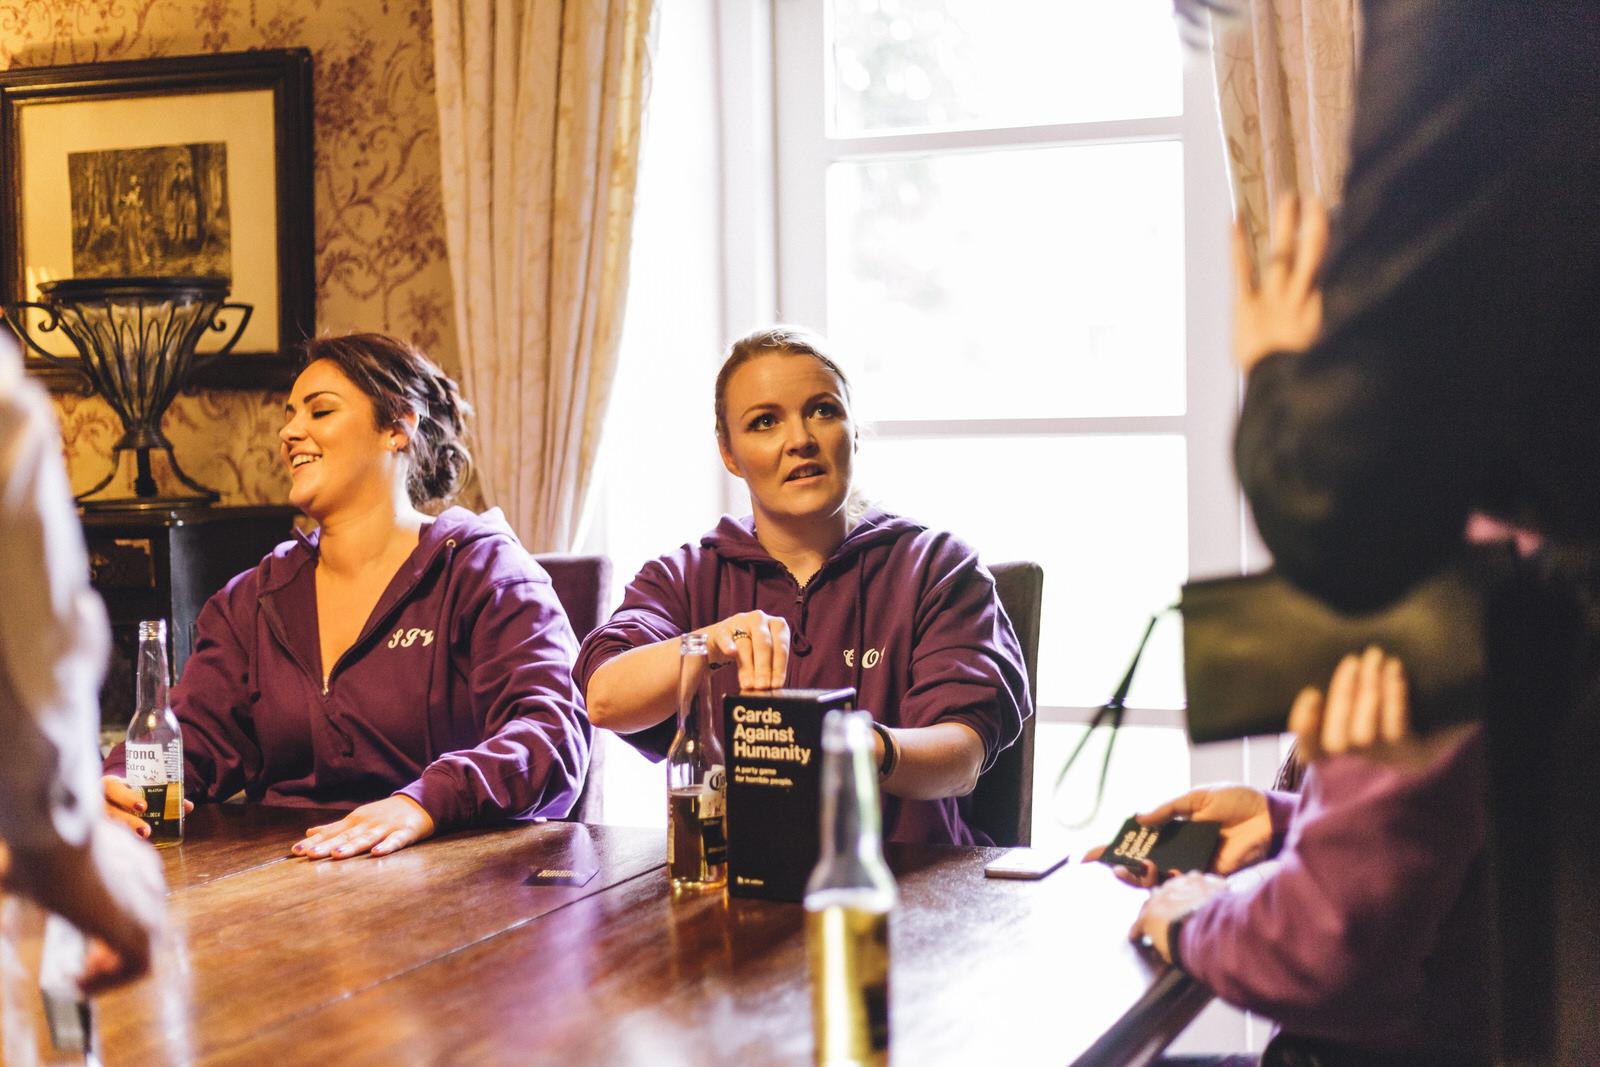 Balybeg-house-ireland-wicklow-wedding-photographer-roger-kenny_greystones006.jpg